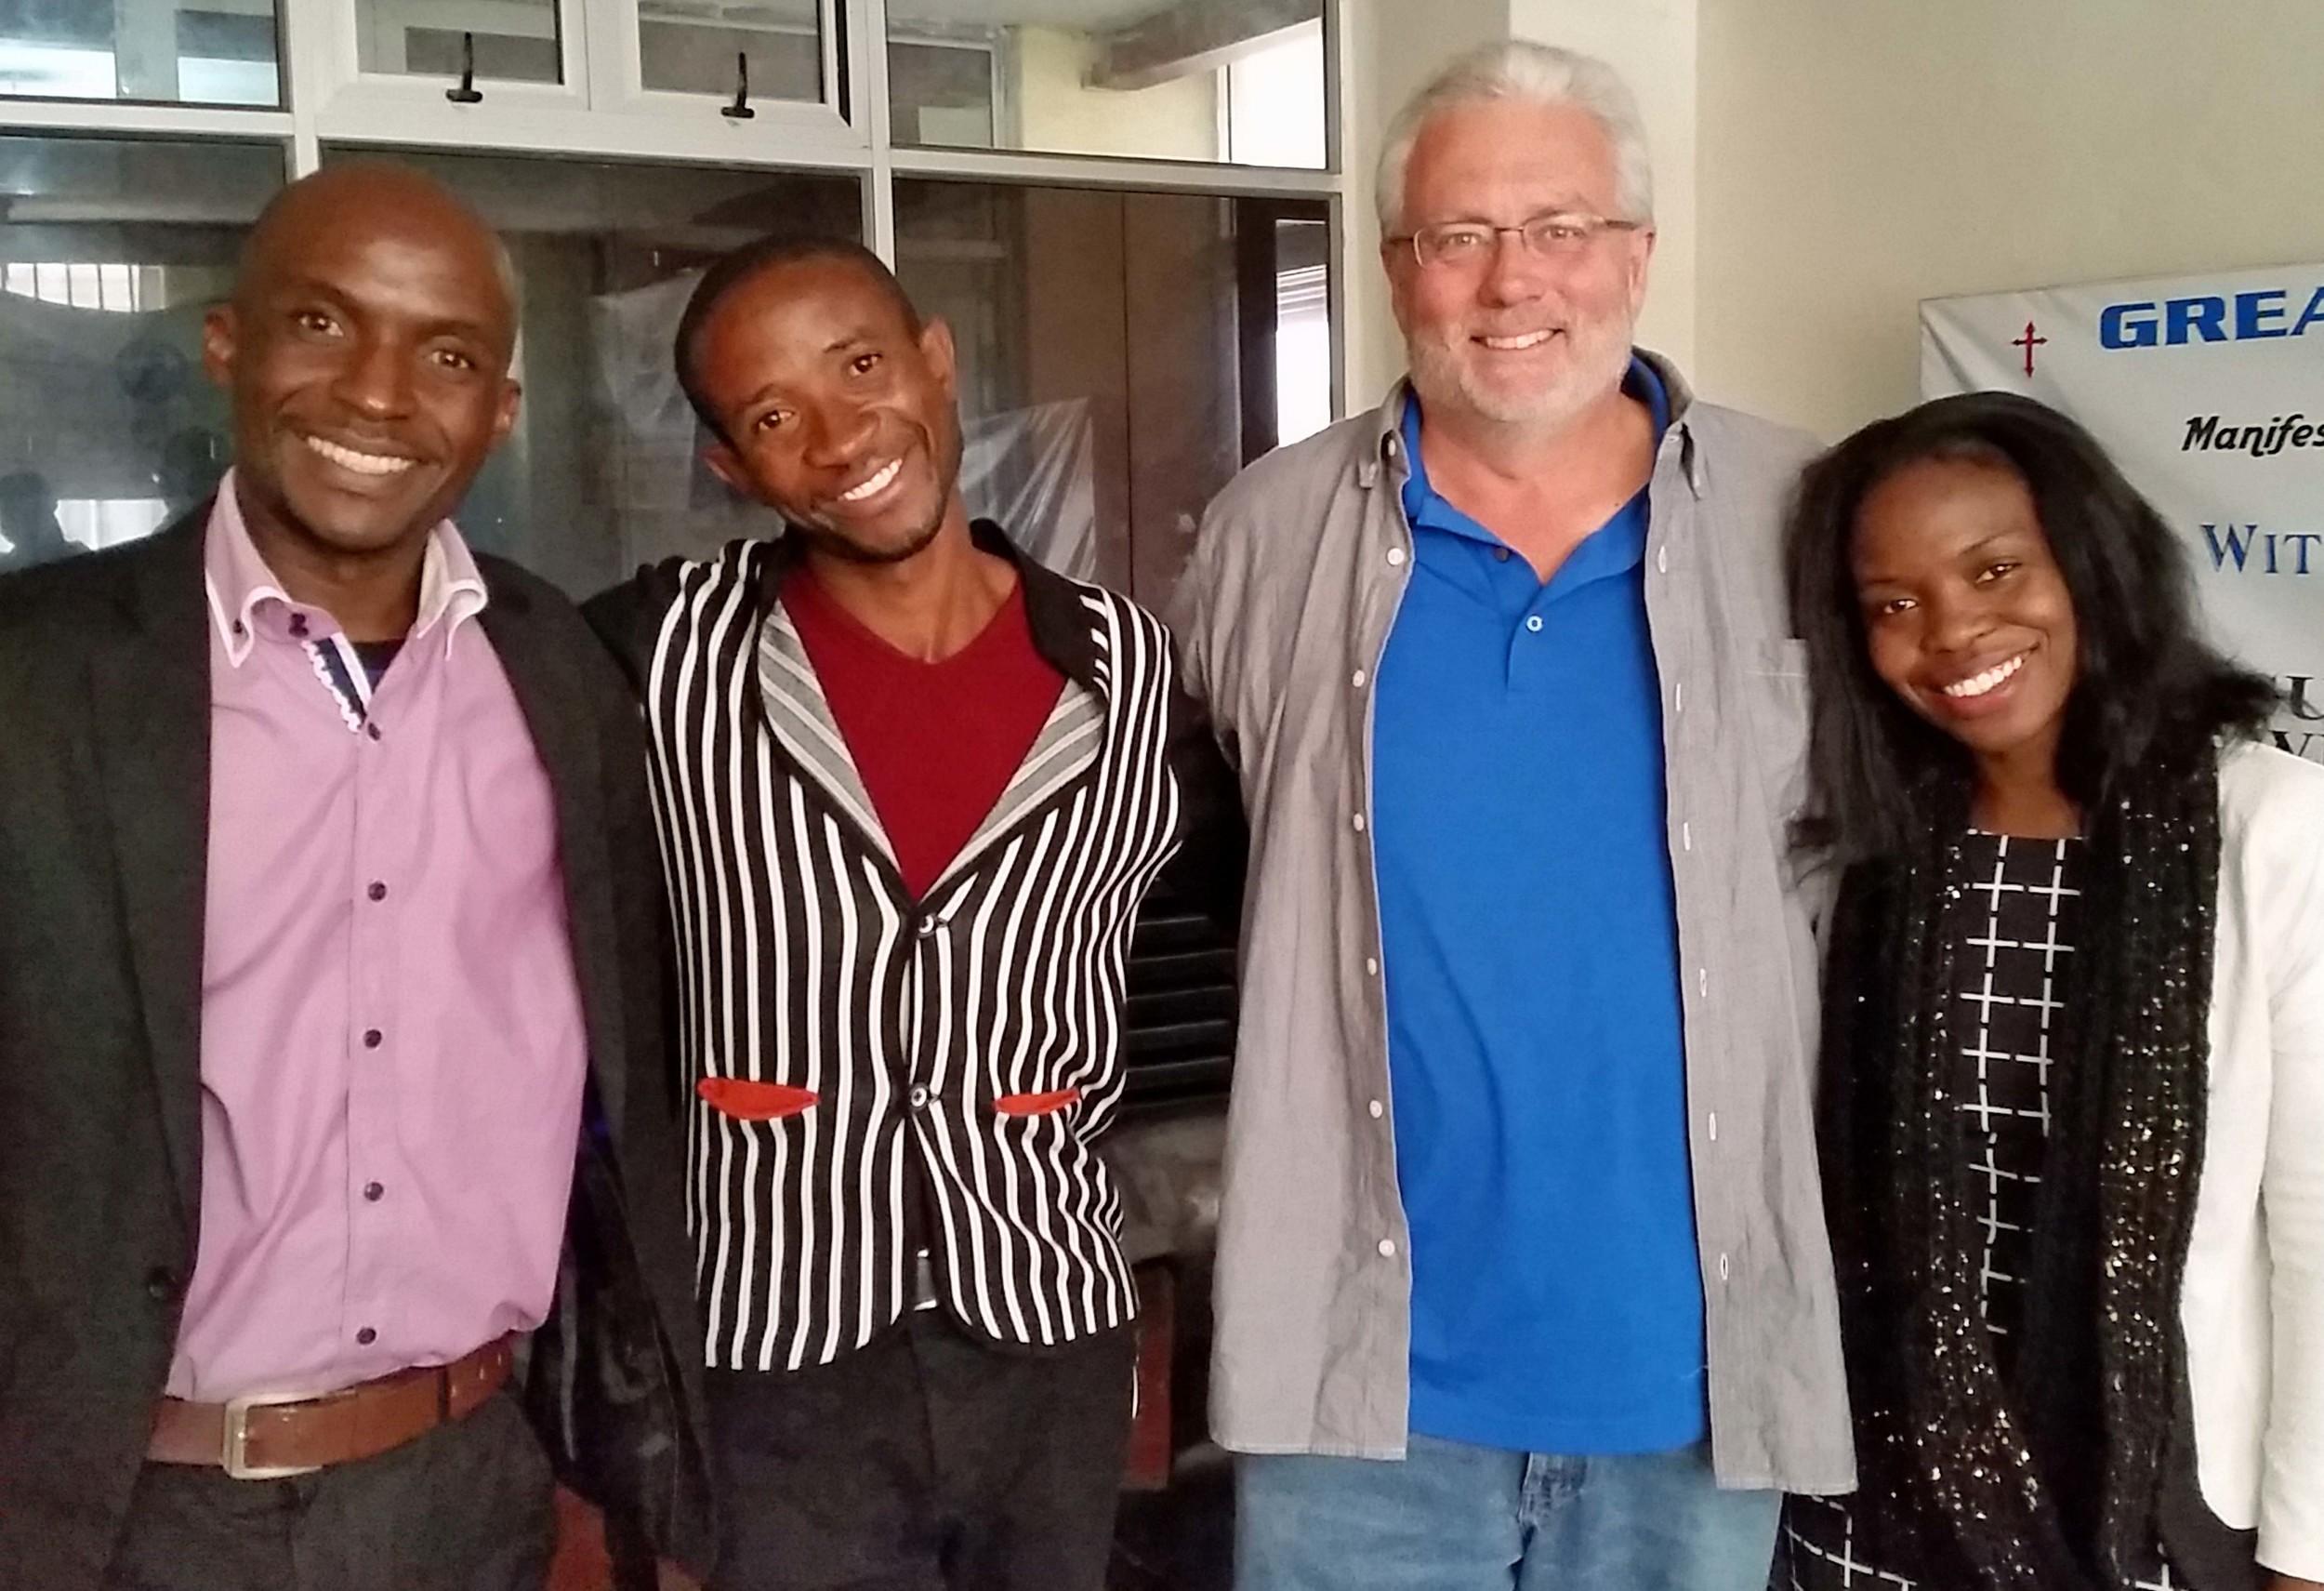 Some of our students (L to R): Paul, John, Doug & Ezi